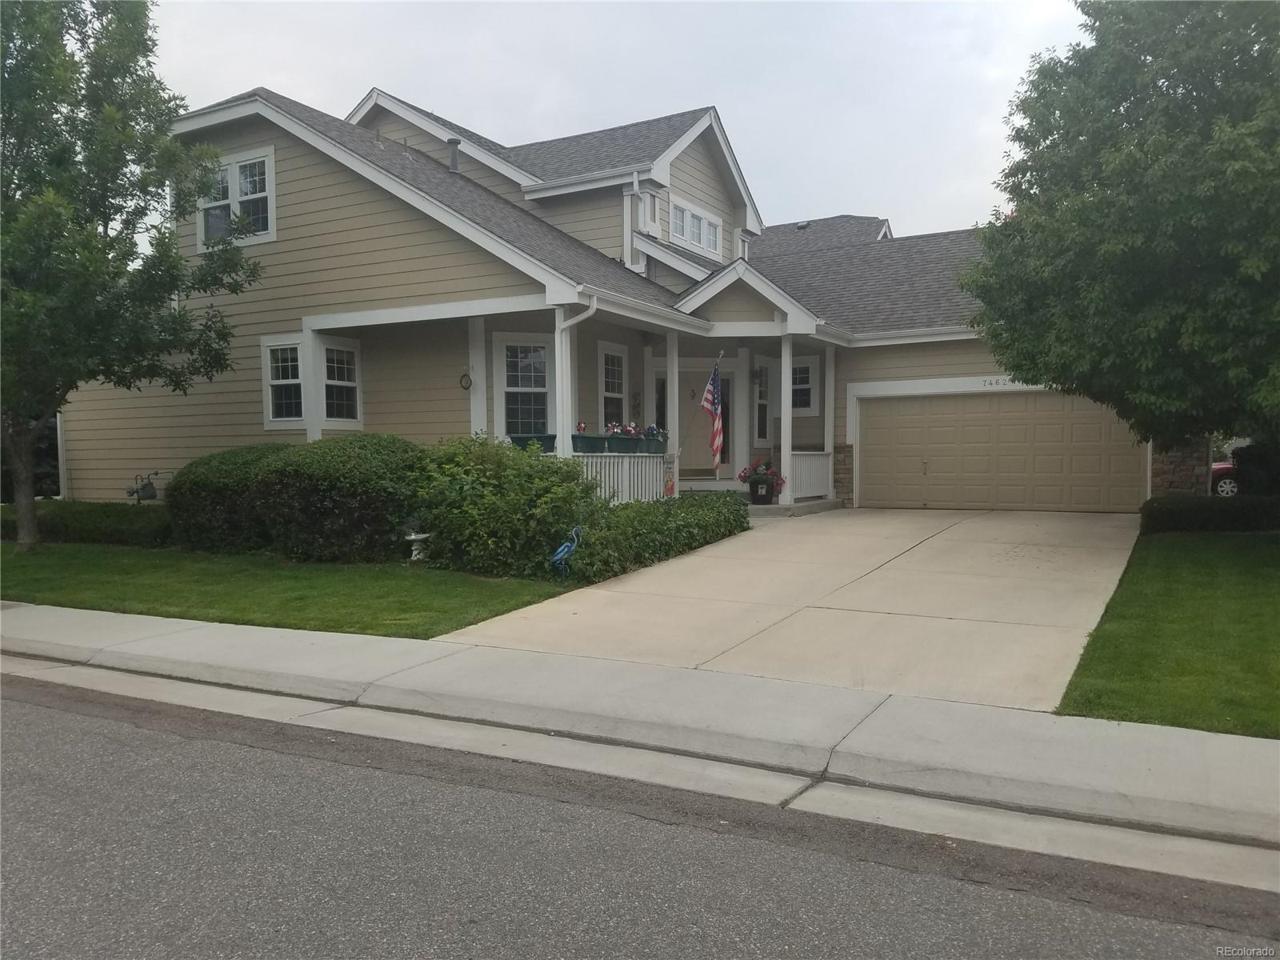 7462 W Saratoga Place, Littleton, CO 80123 (MLS #9216166) :: 8z Real Estate